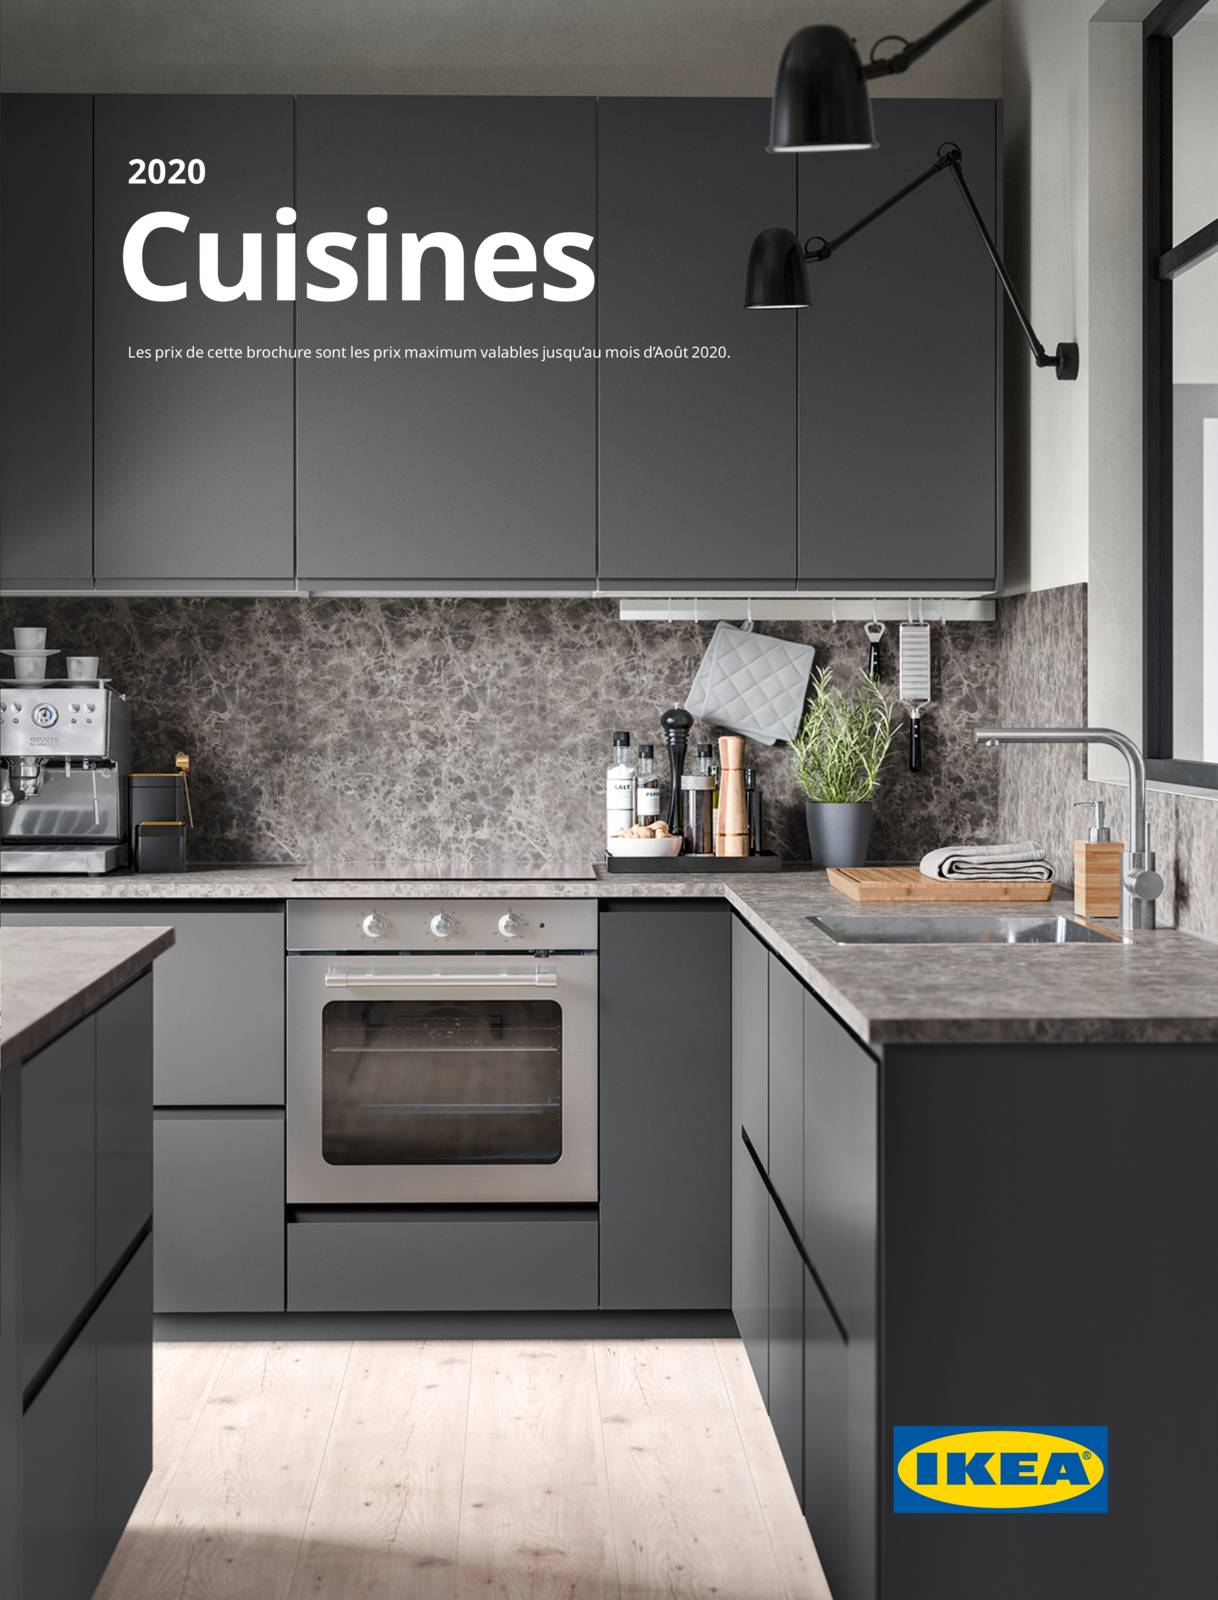 IKEA maroc Catalogue 16 Cuisines  Promotion au maroc